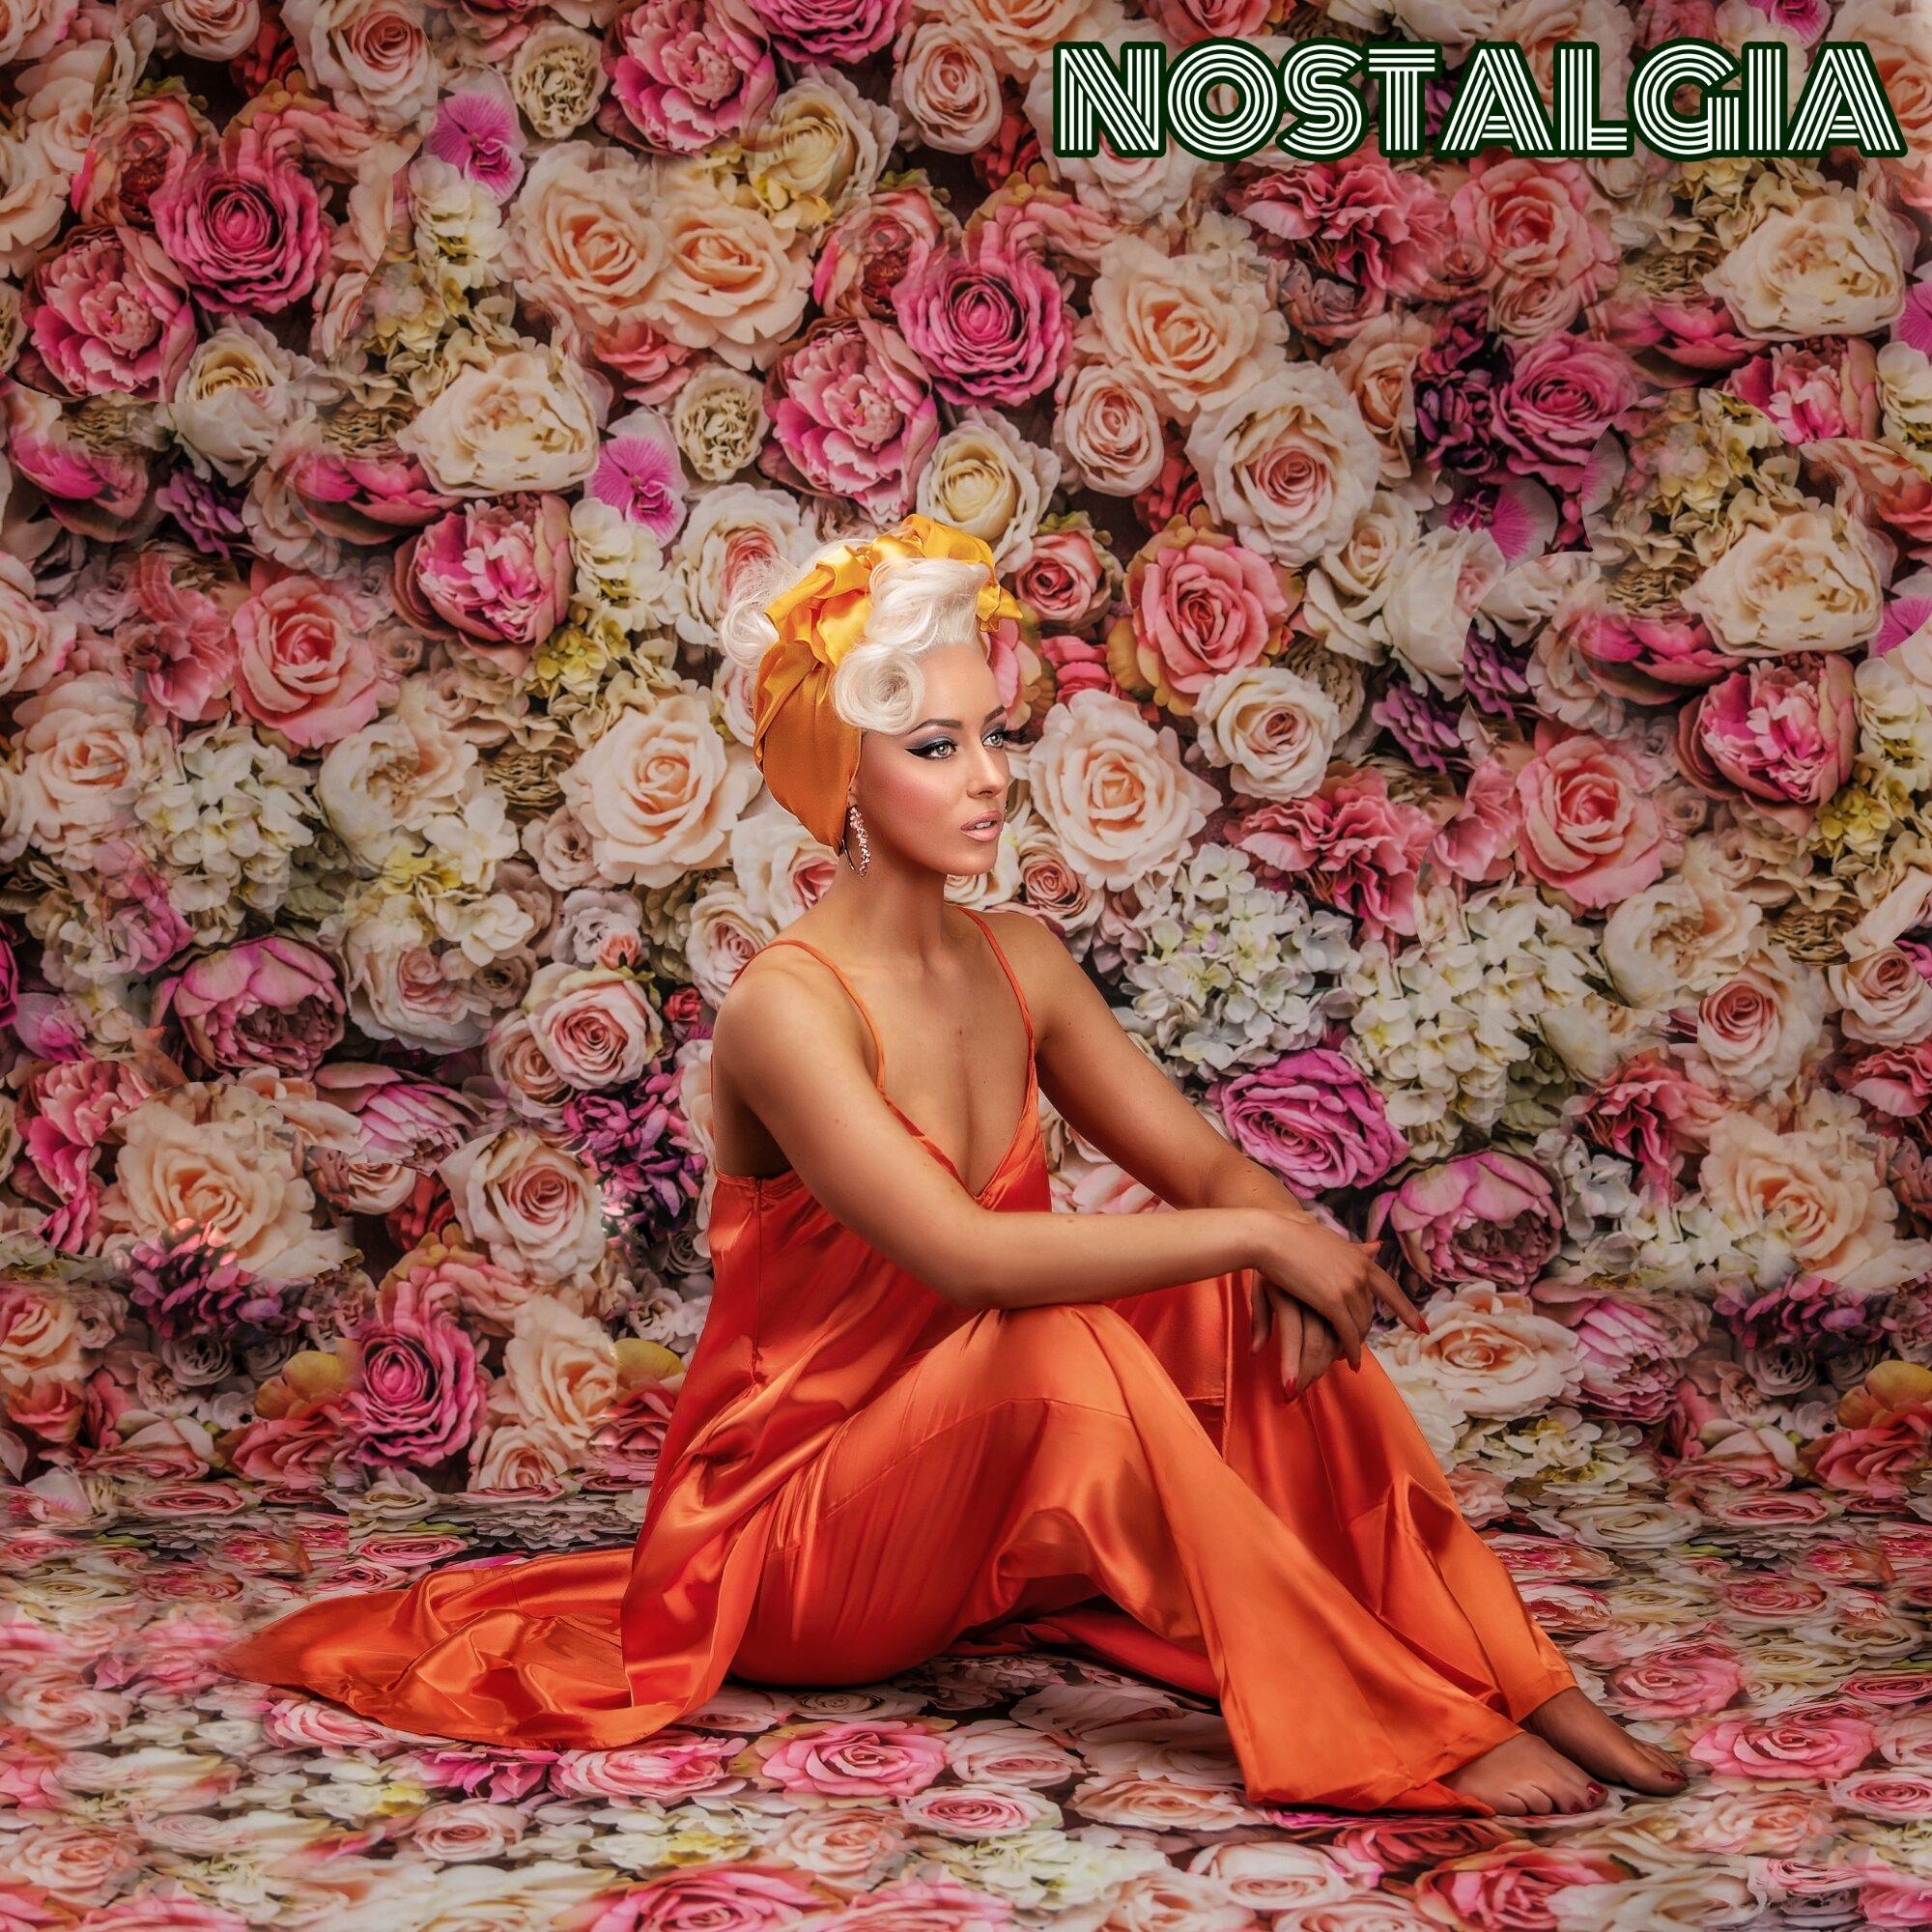 Hatty Keane Writes Timeless Music With New EP Titled Nostalgia